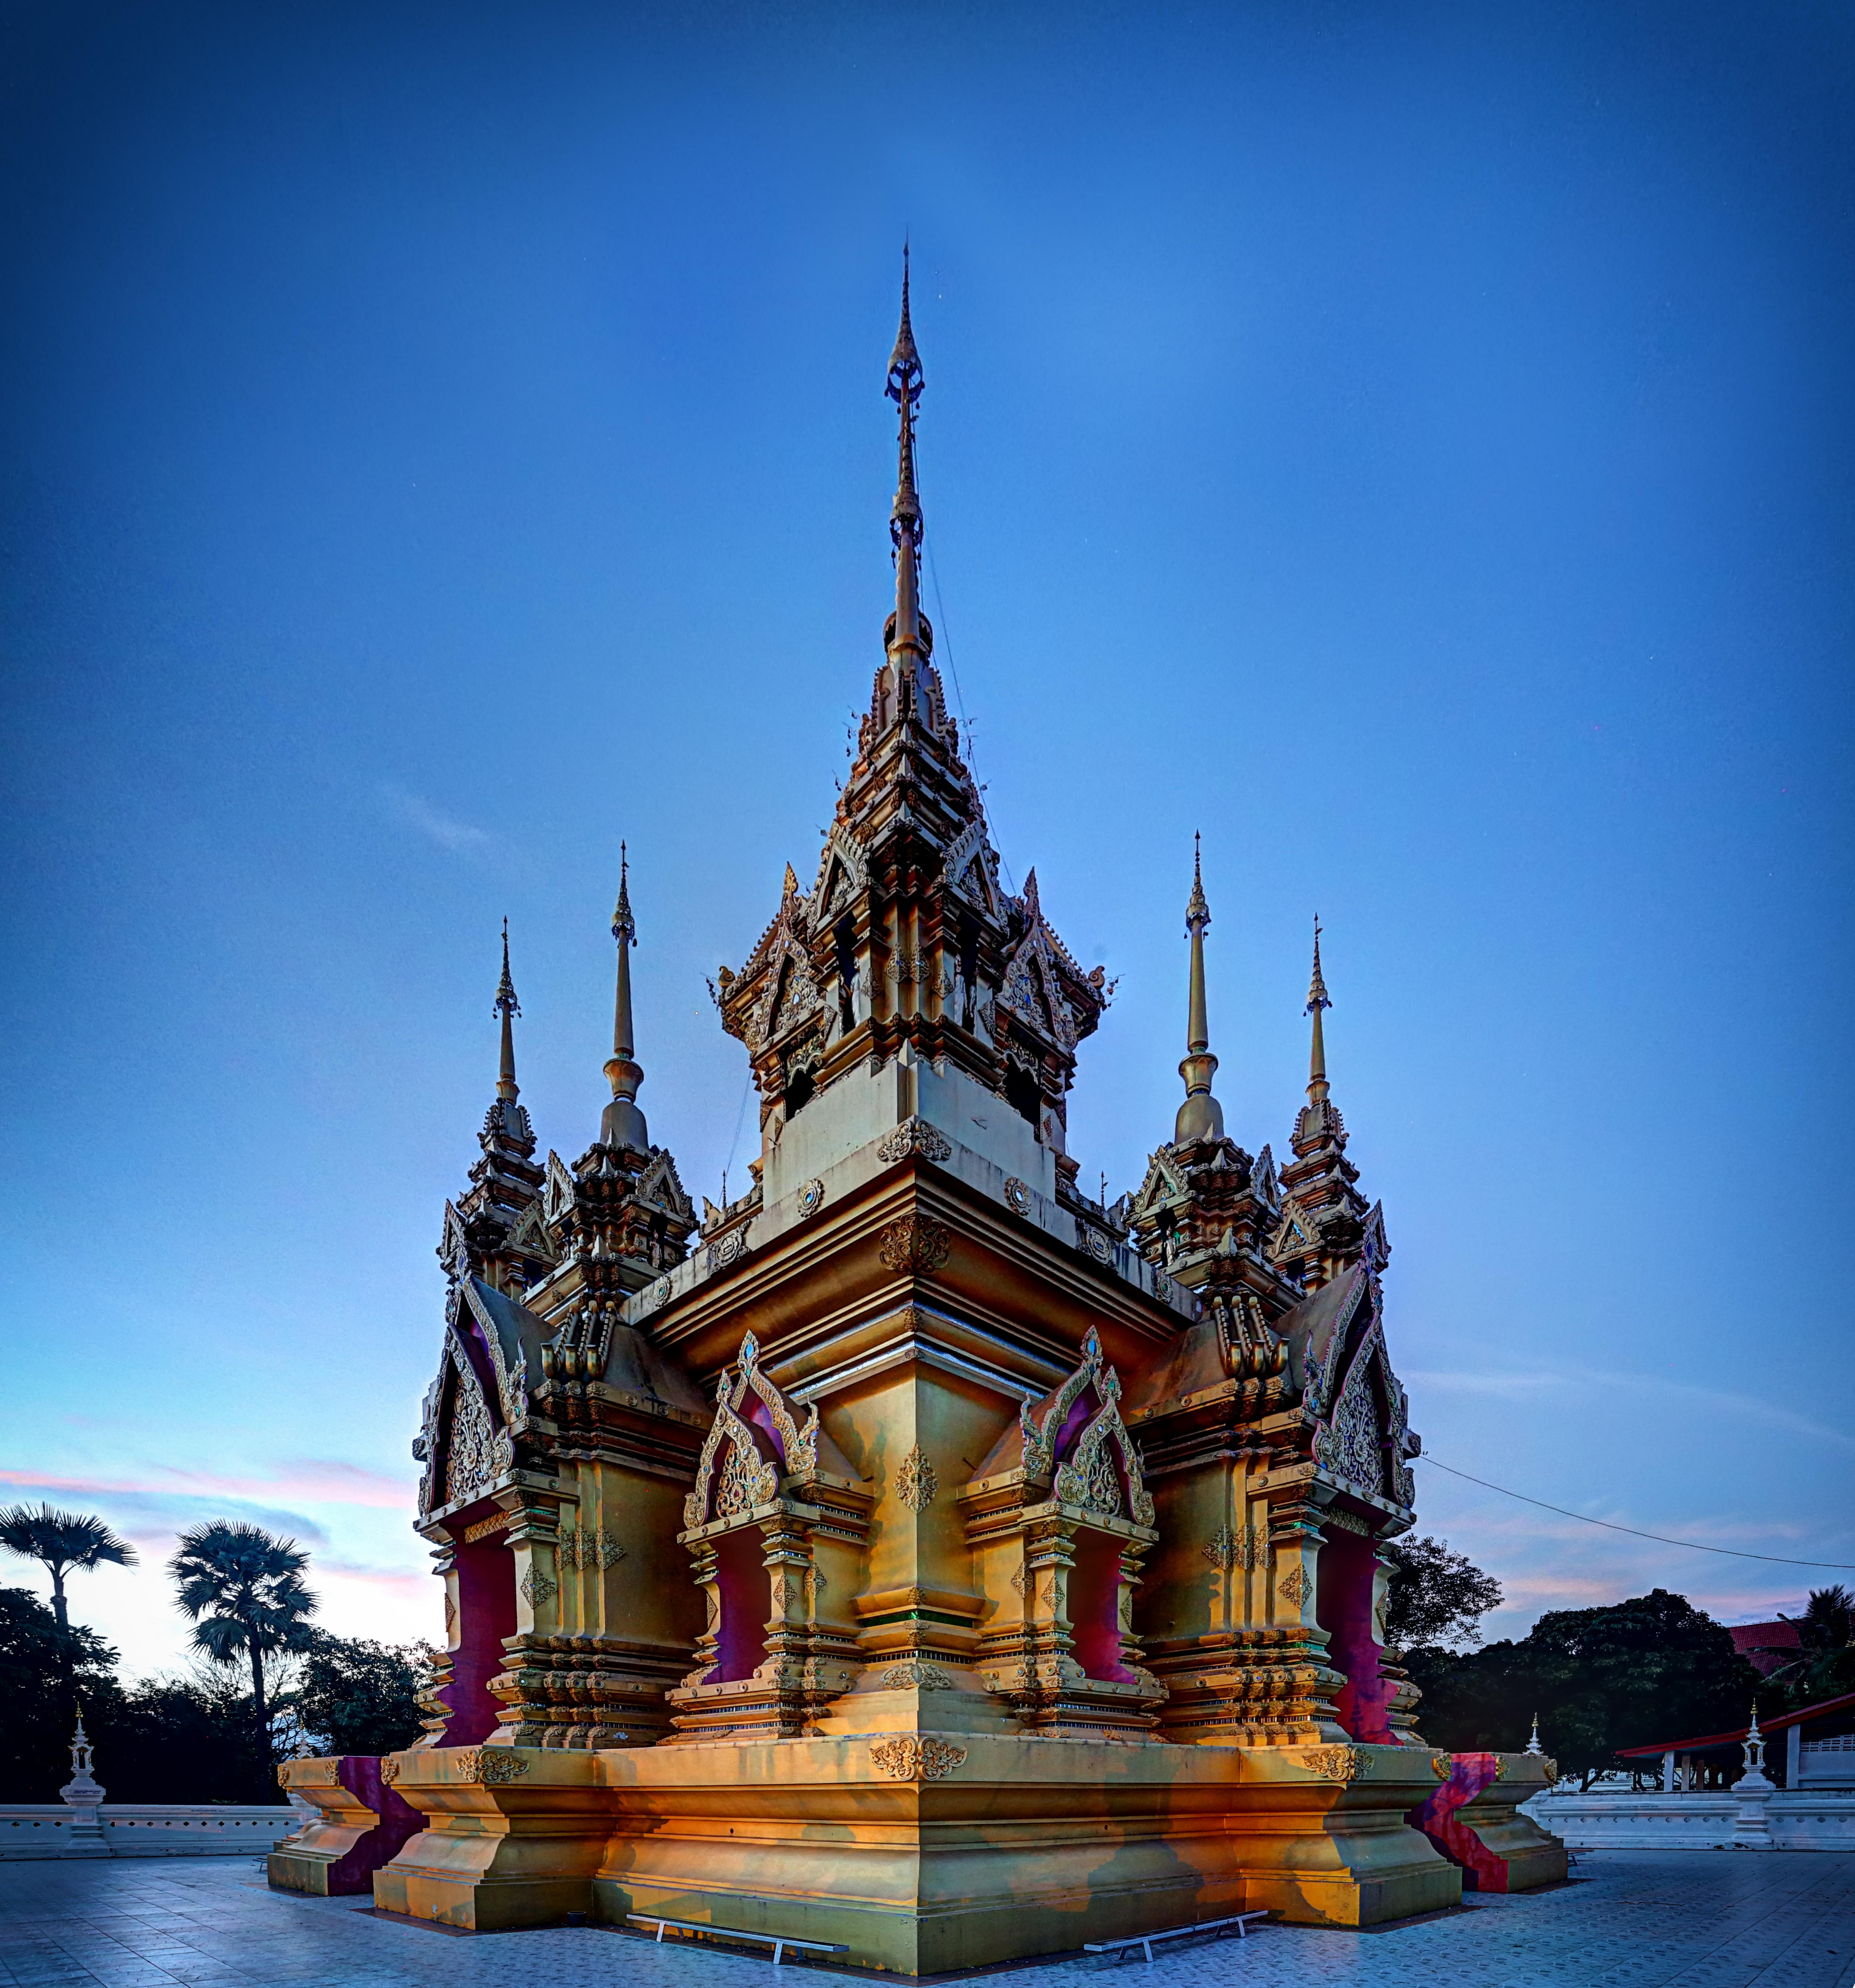 Elevation of Sop Tia, Chom Thong District, Chiang Mai